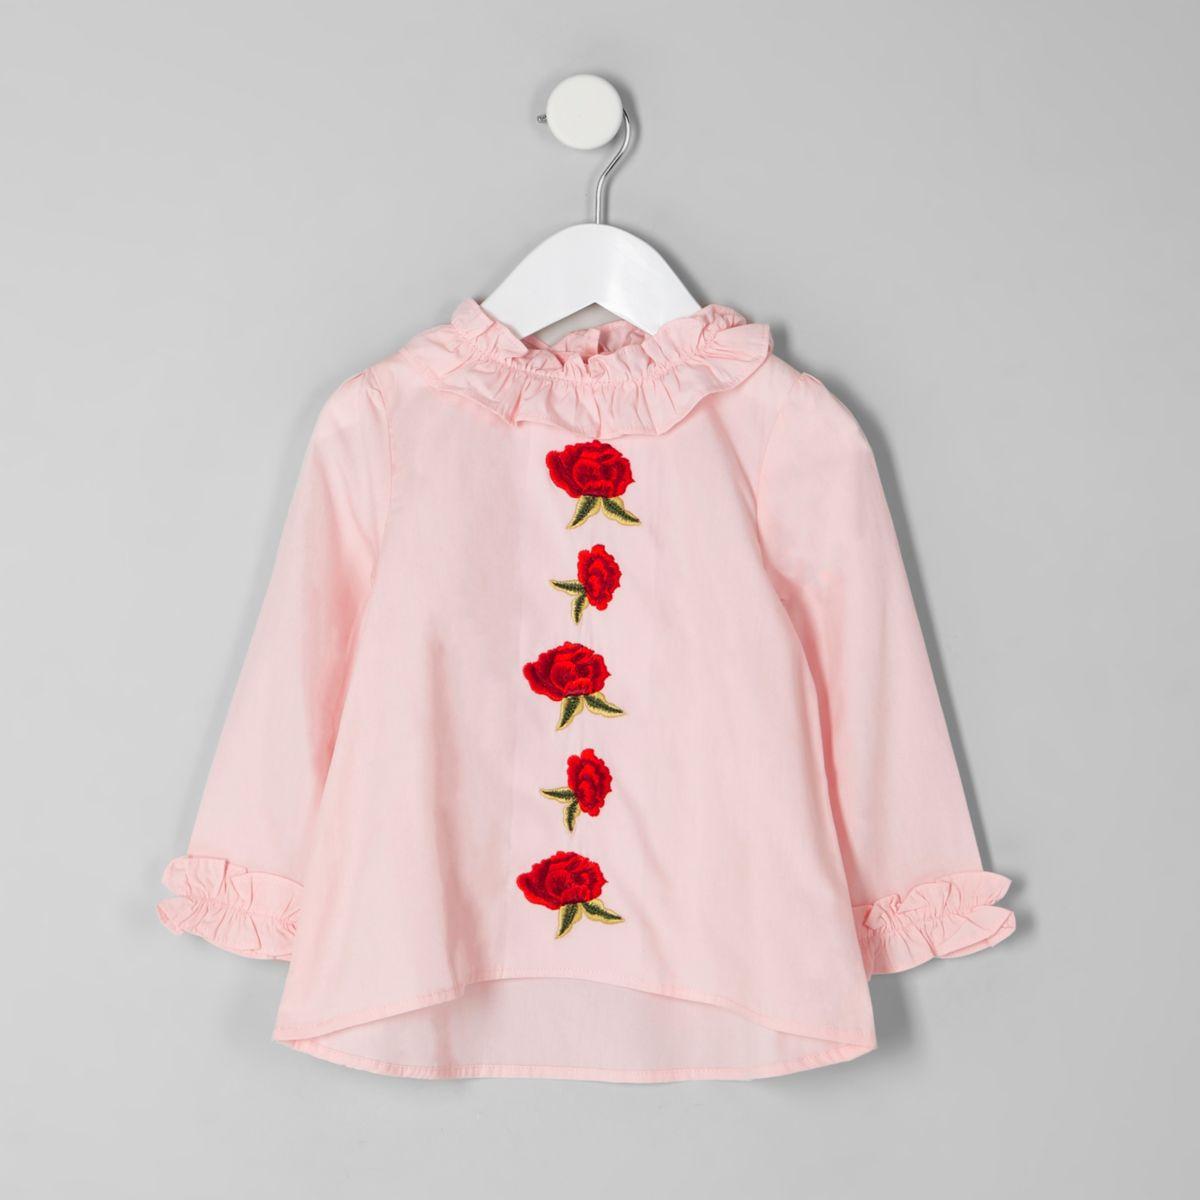 Mini girls pink rose applique ruffle neck top